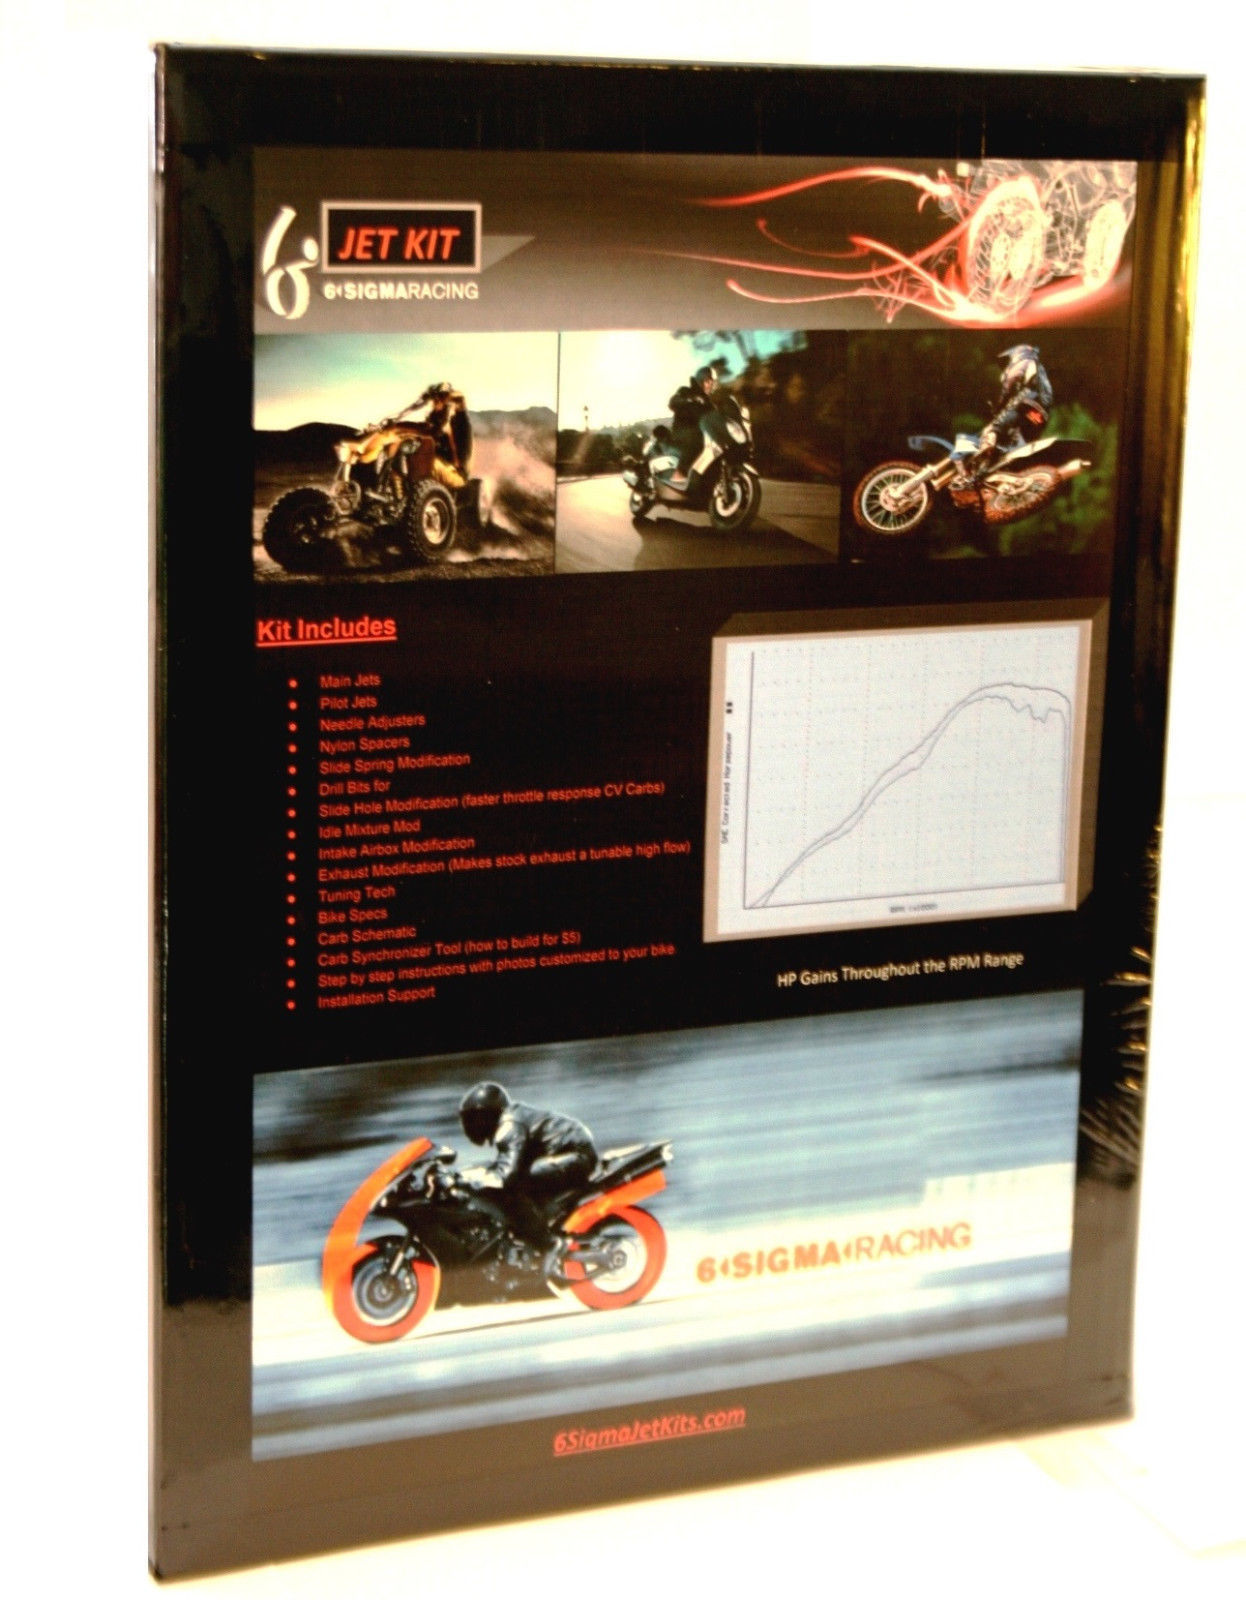 DEMON DXR 2 125 Pitbike Custom Jetting Carburetor Carb Stage 1-9 Jet Kit